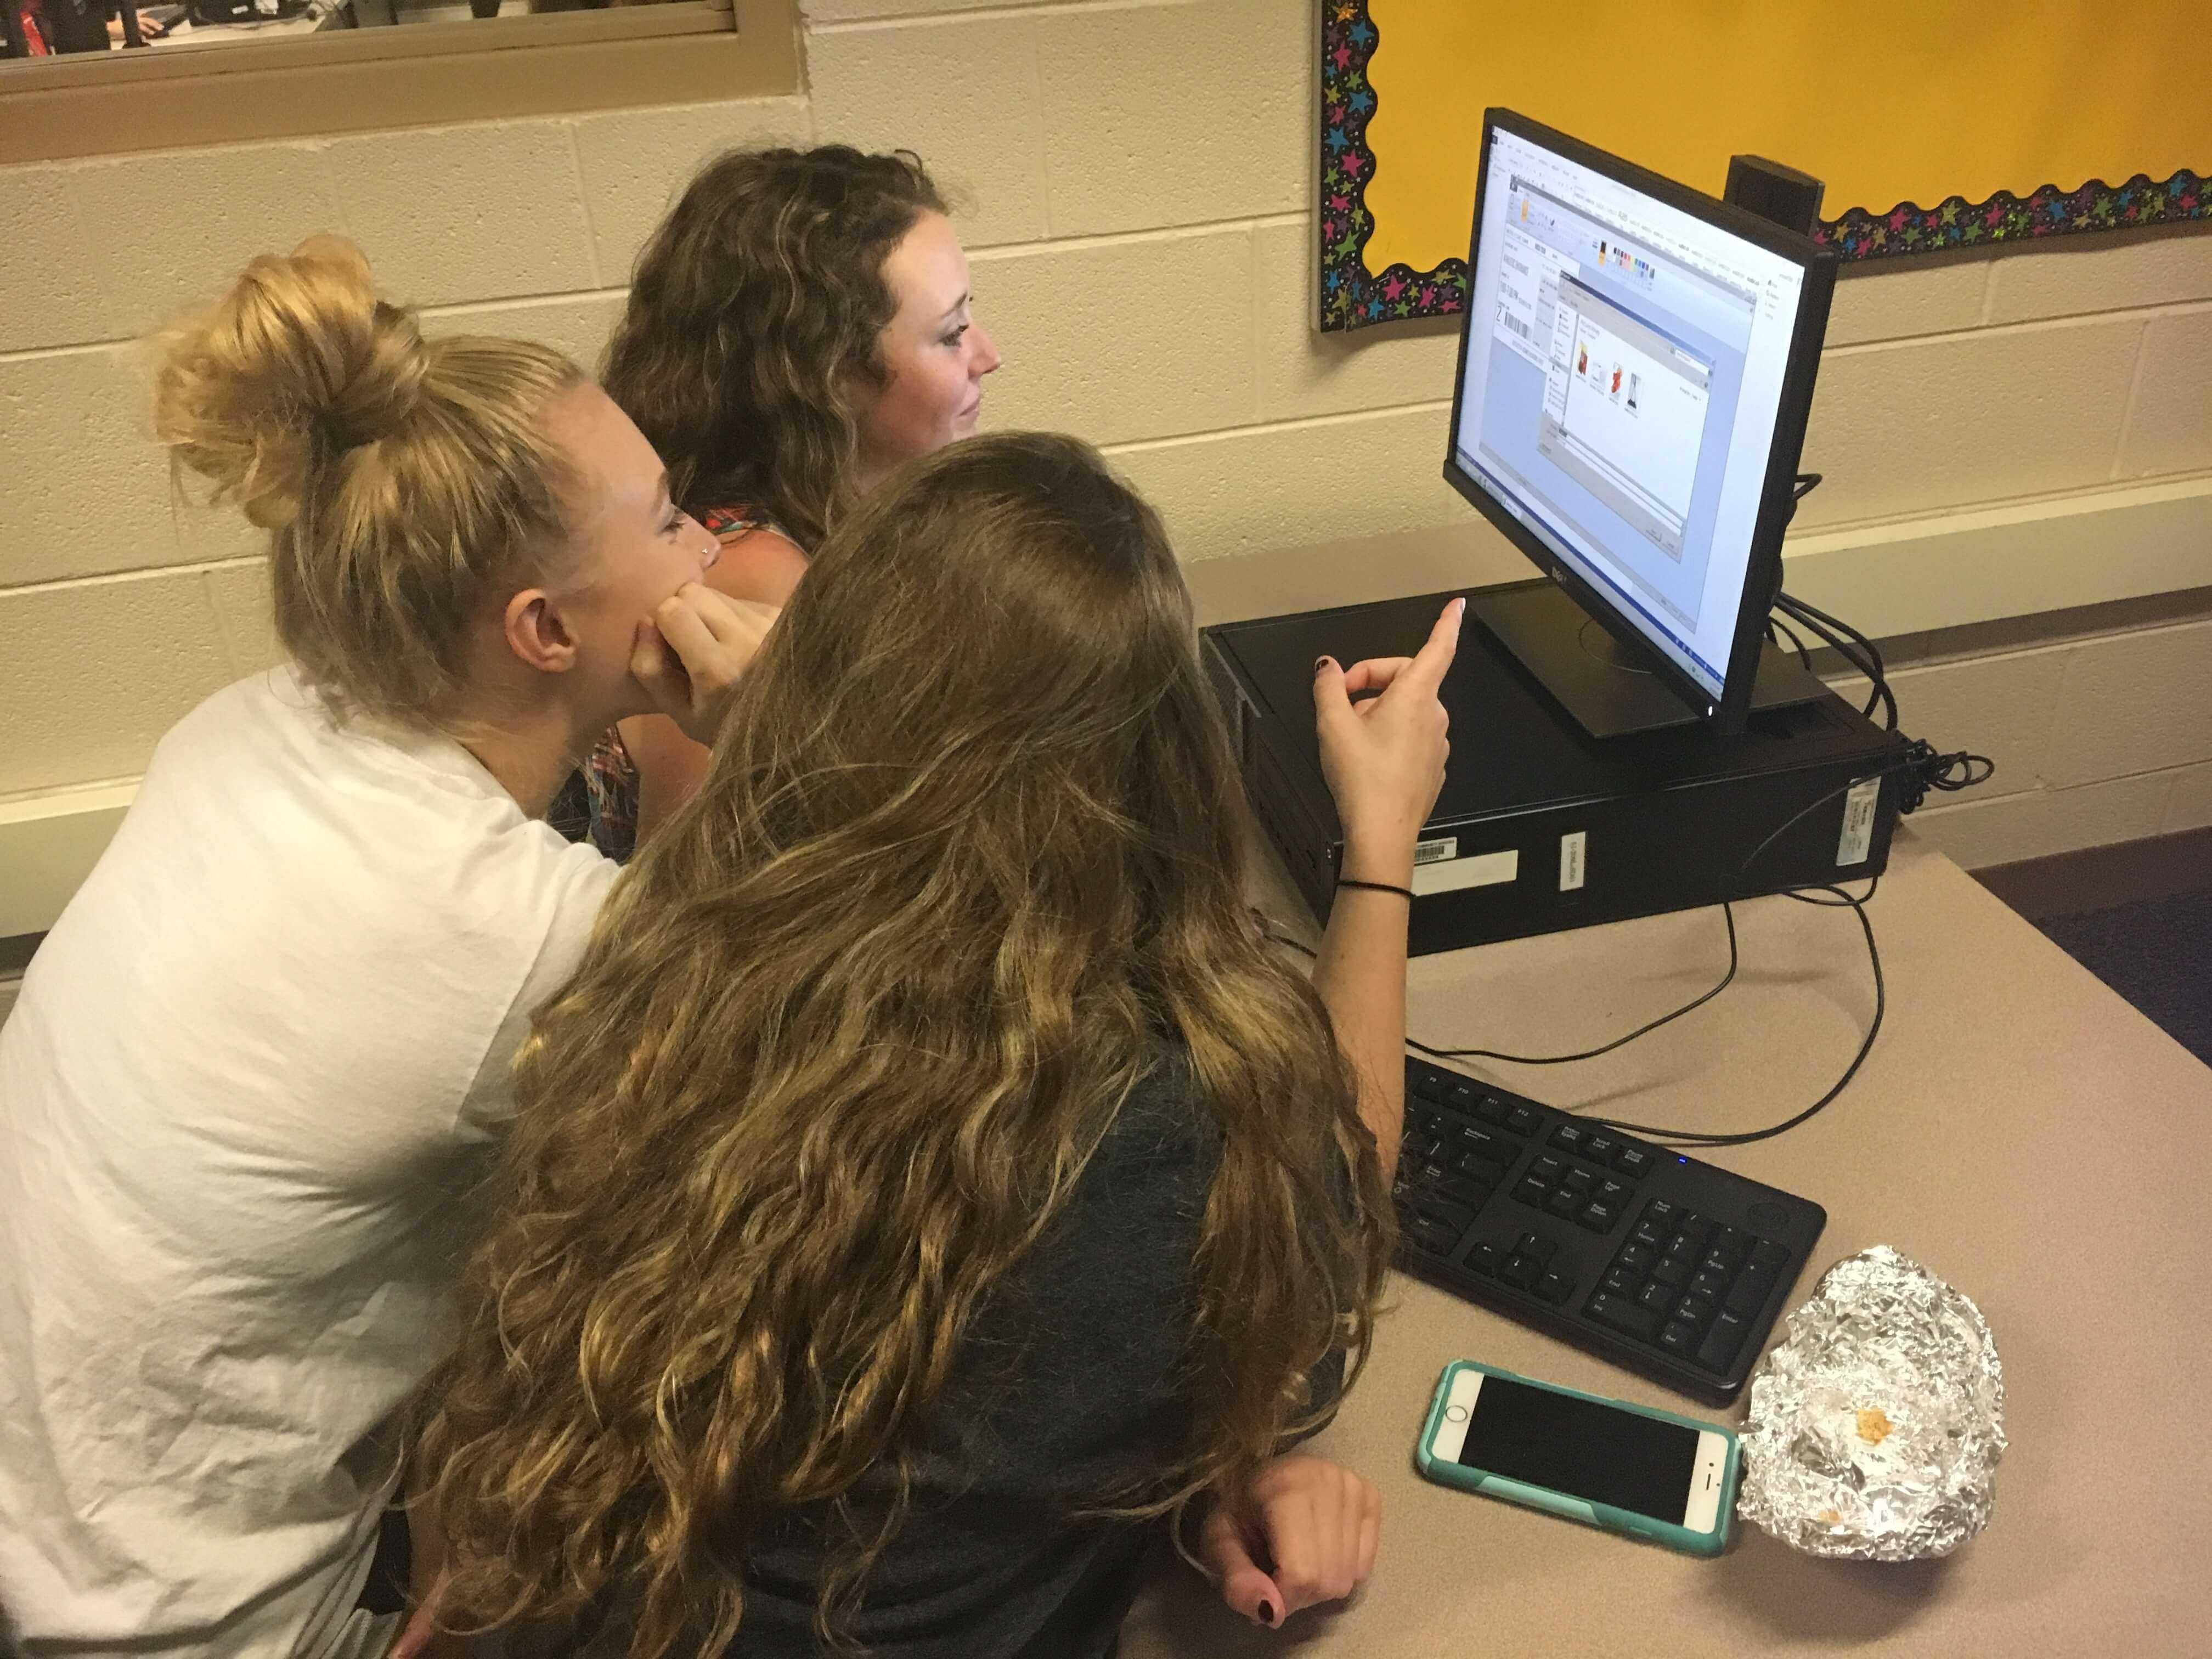 Student Council members Julia Moran, Kiley Ward, and Morgan McDonald are hard at work planning for October's festivities.